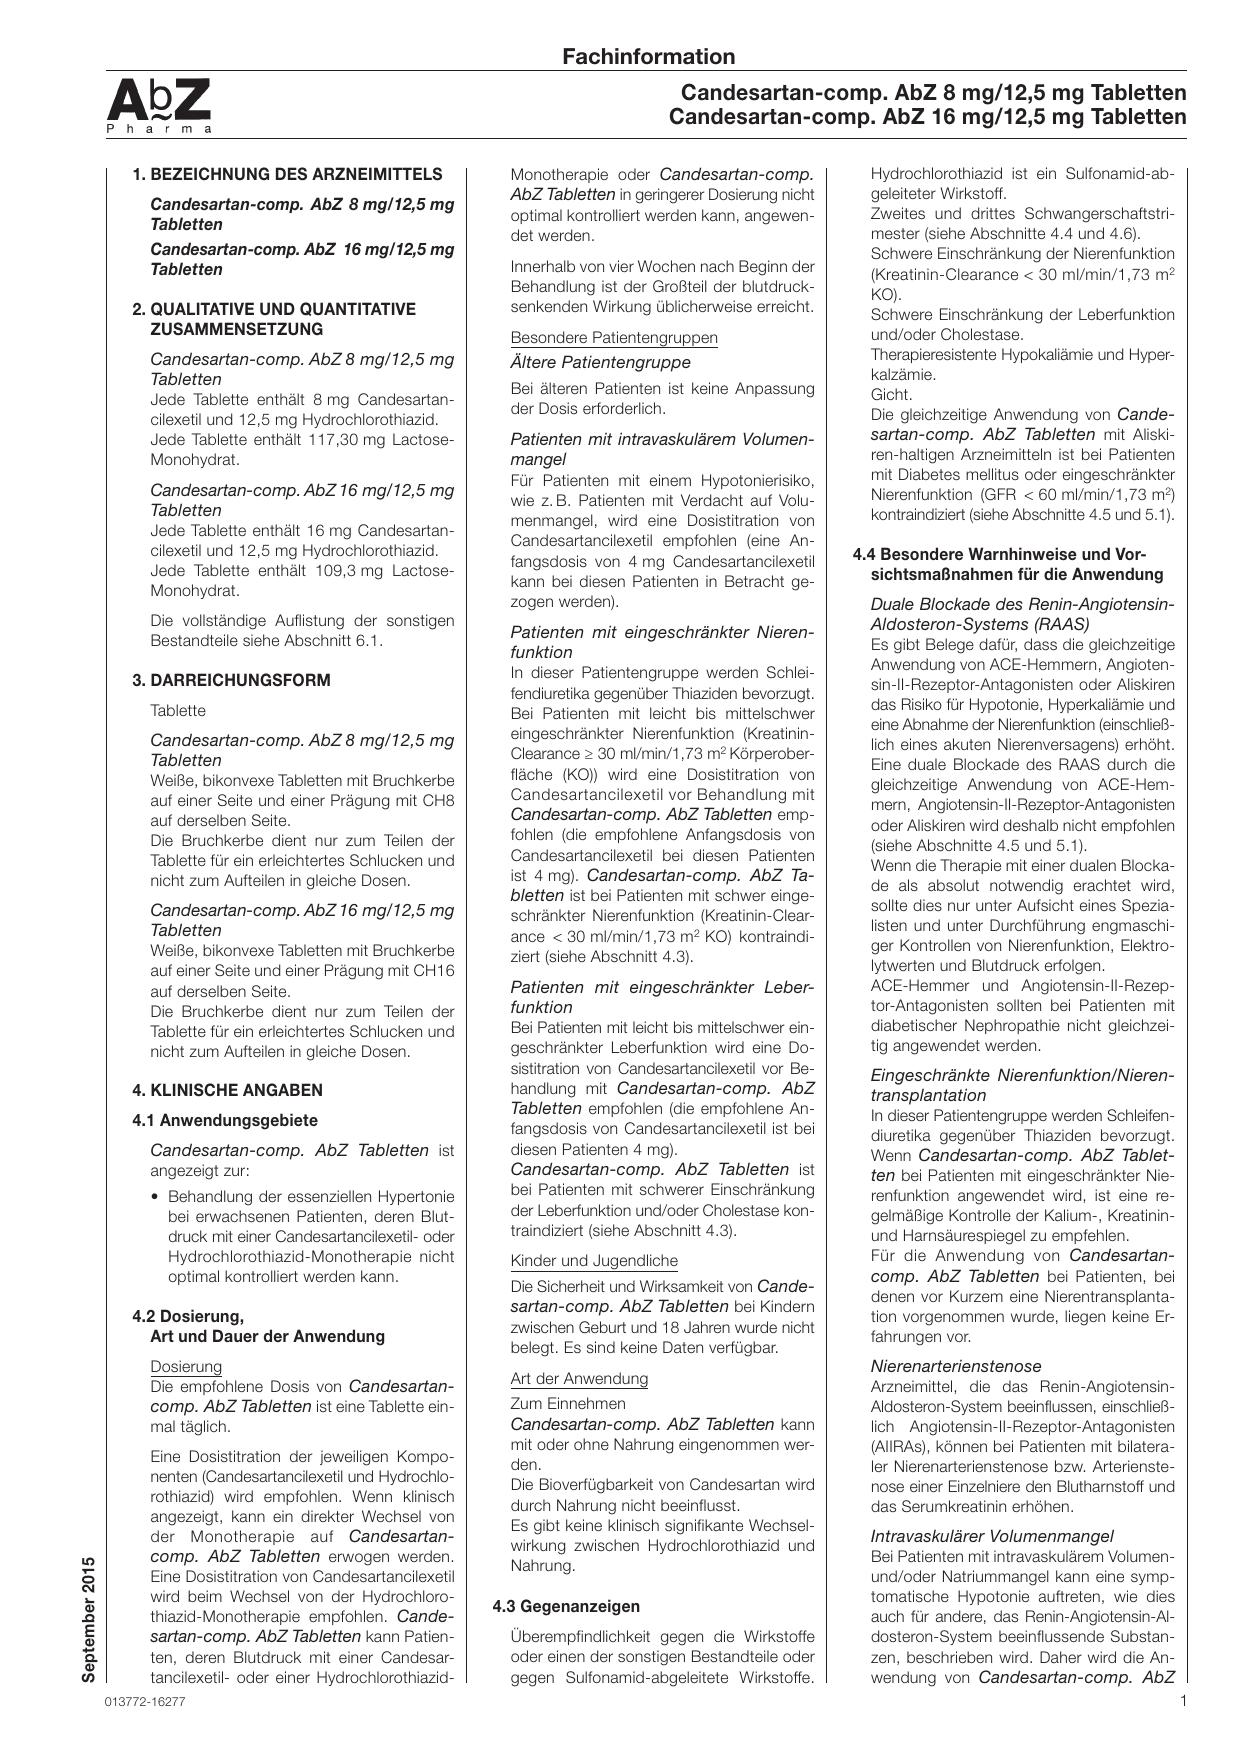 Candesartan-comp. AbZ 8 mg/12,5 mg Tabletten Candesartan